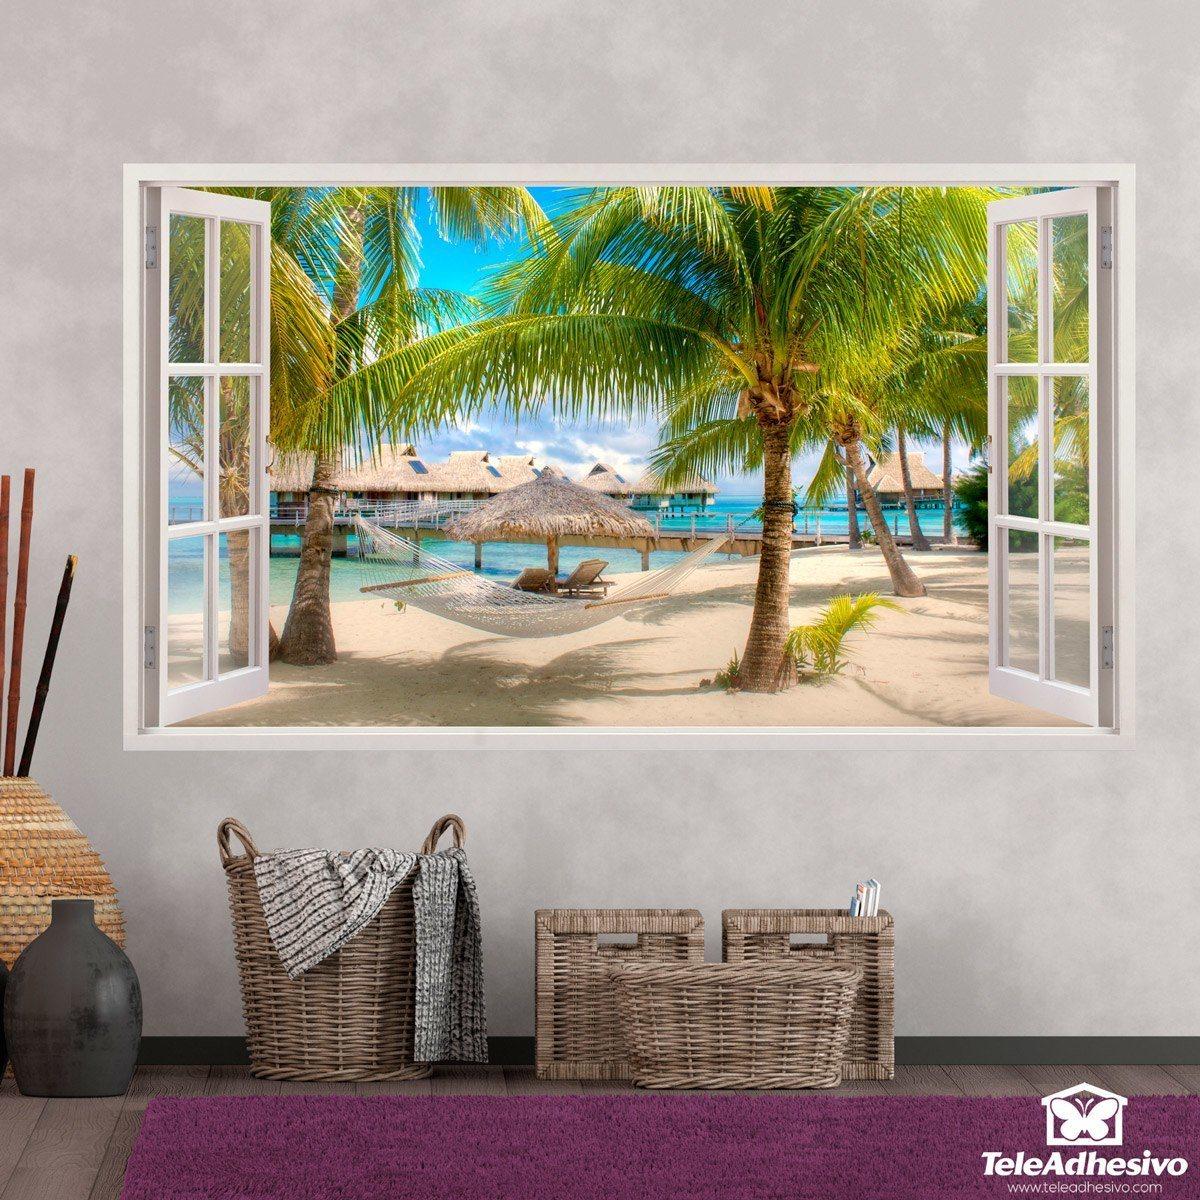 Vinilos adhesivos decorativos de ventanas teleadhesivo - Posters de vinilo ...